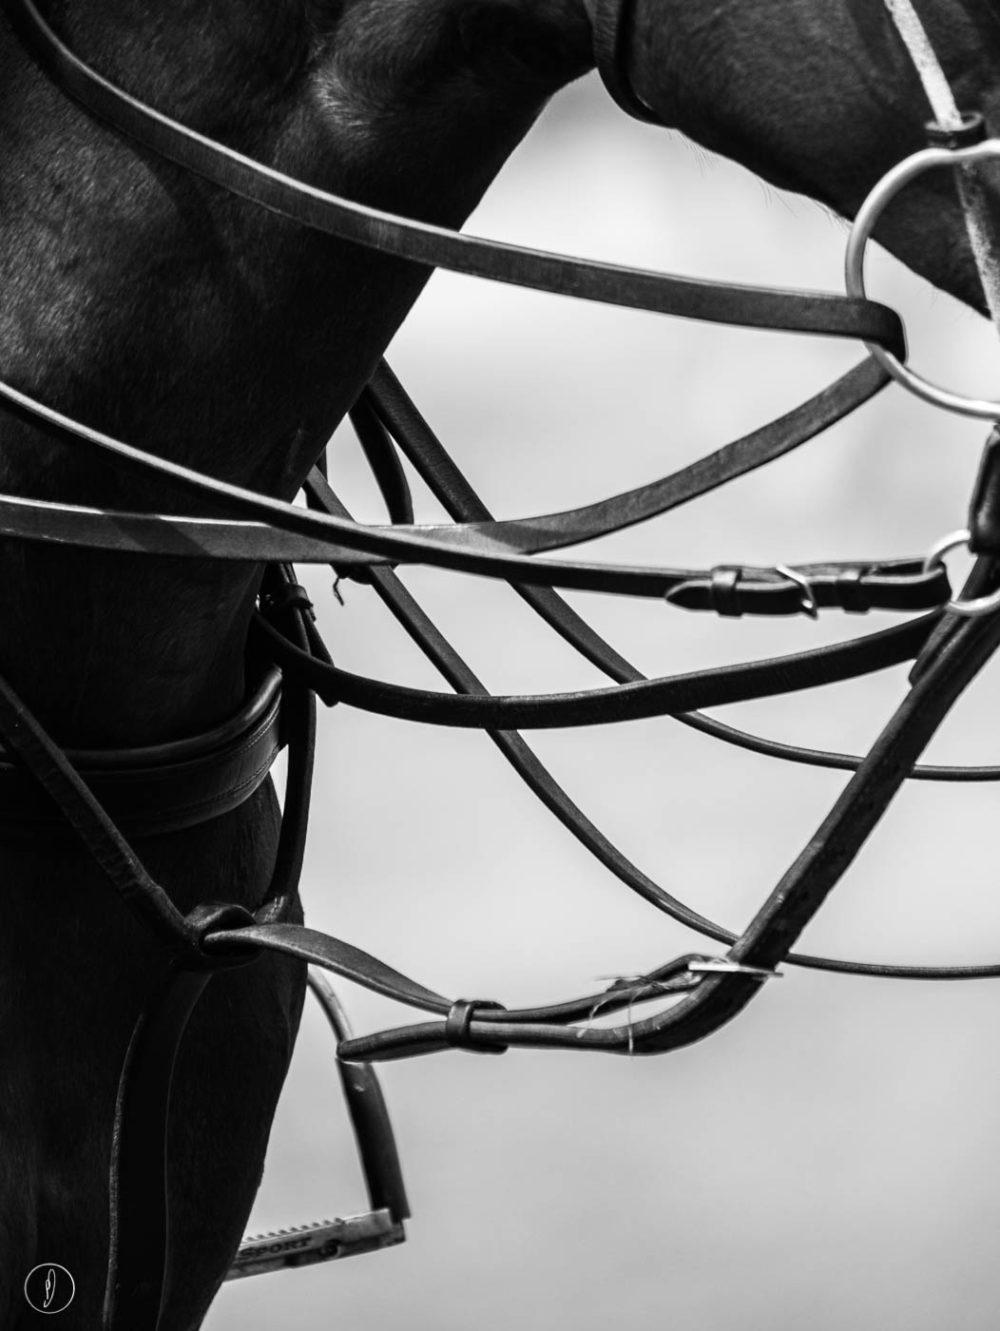 Equestrian fine art photography